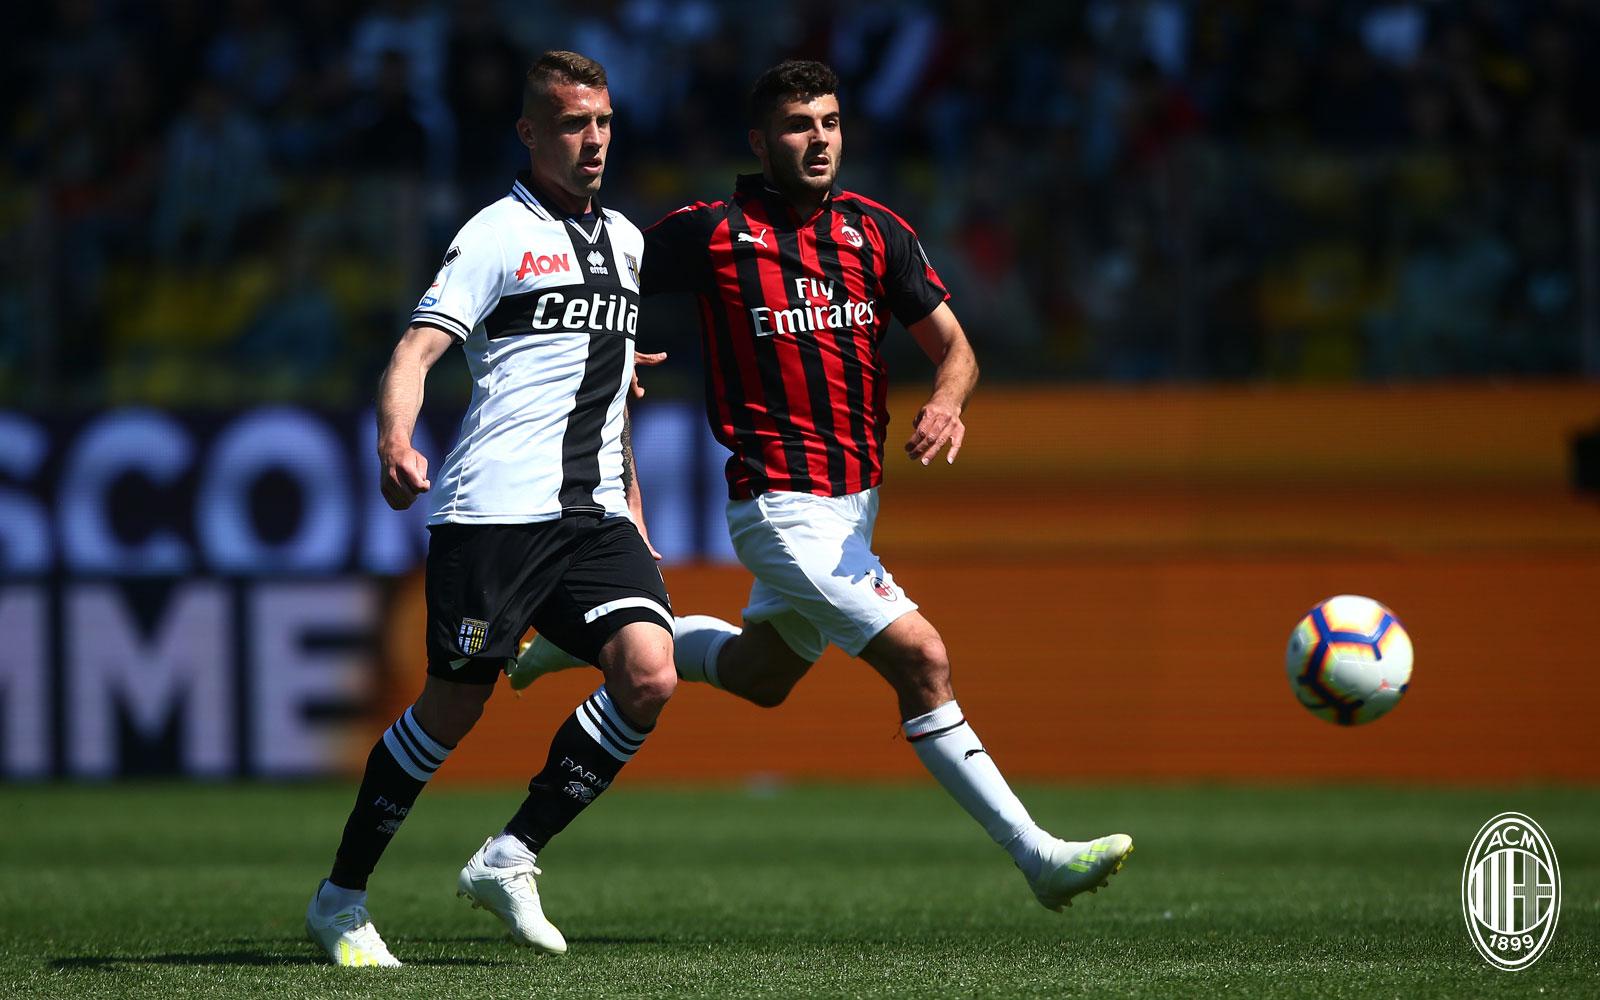 Patrick Cutrone during Parma-Milan at Stadio Ennio Tardini on April 20, 2019. (@acmilan.com)